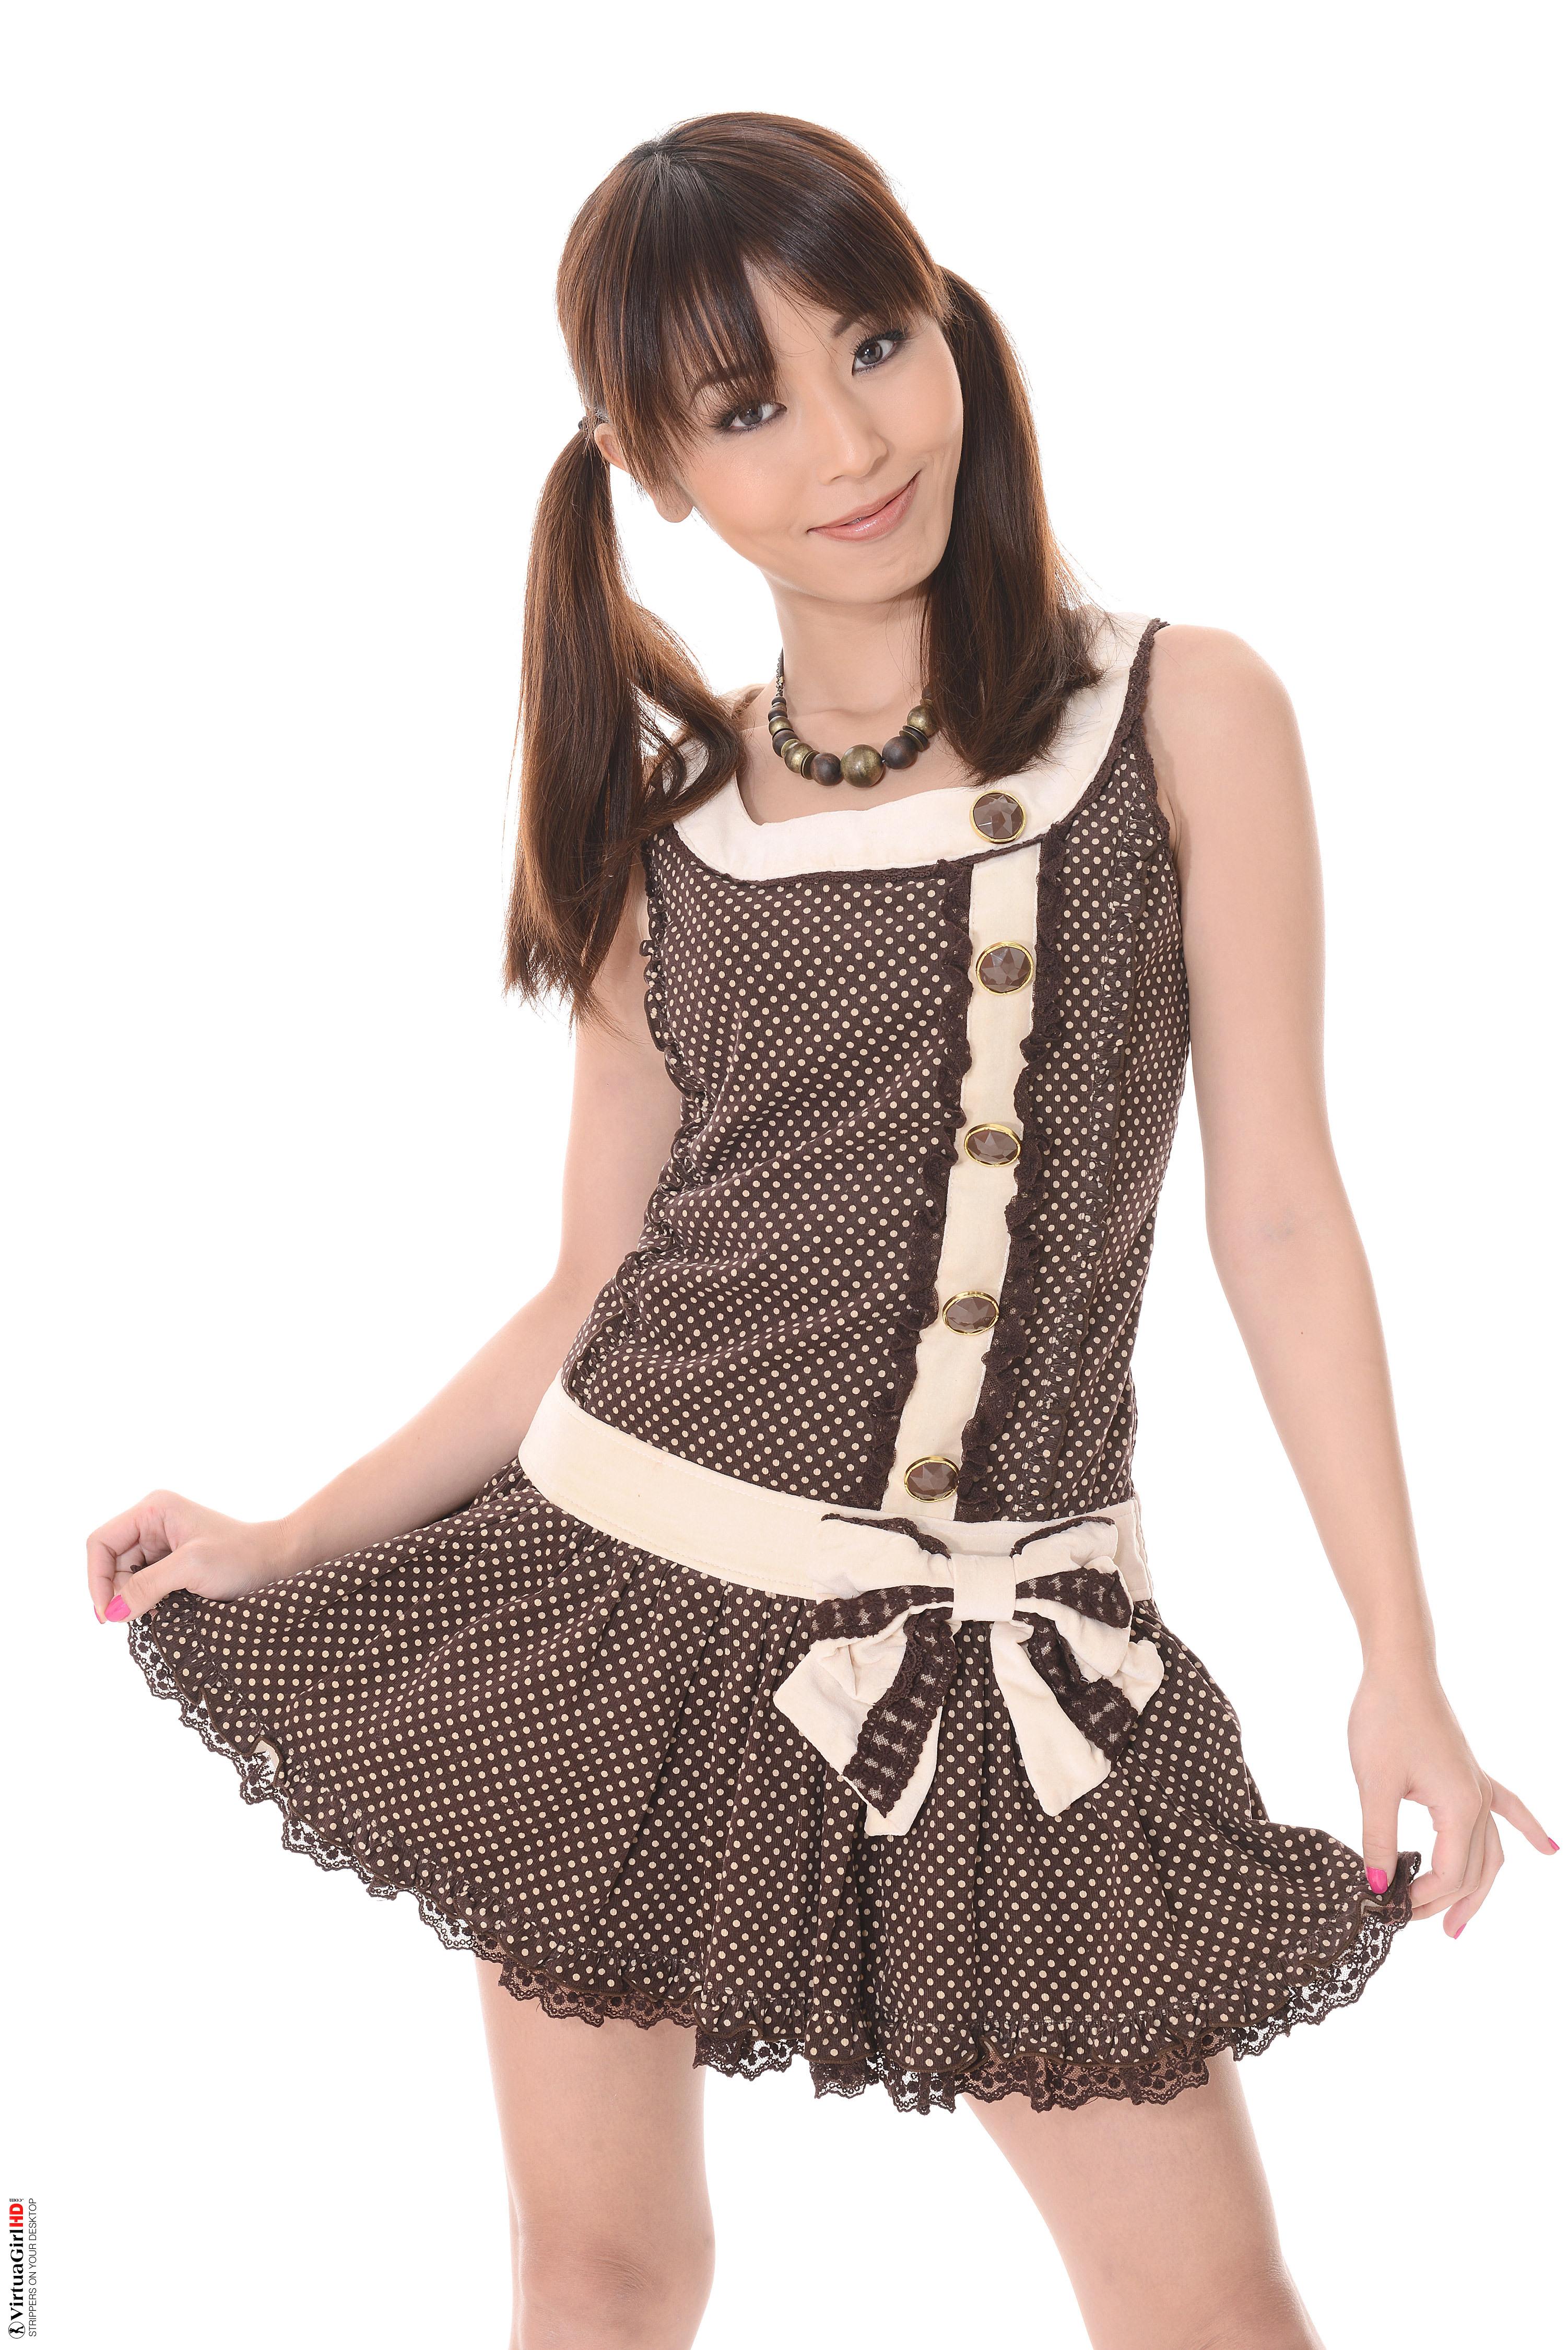 Wonderful japanese porn star ver1 - 3 part 5